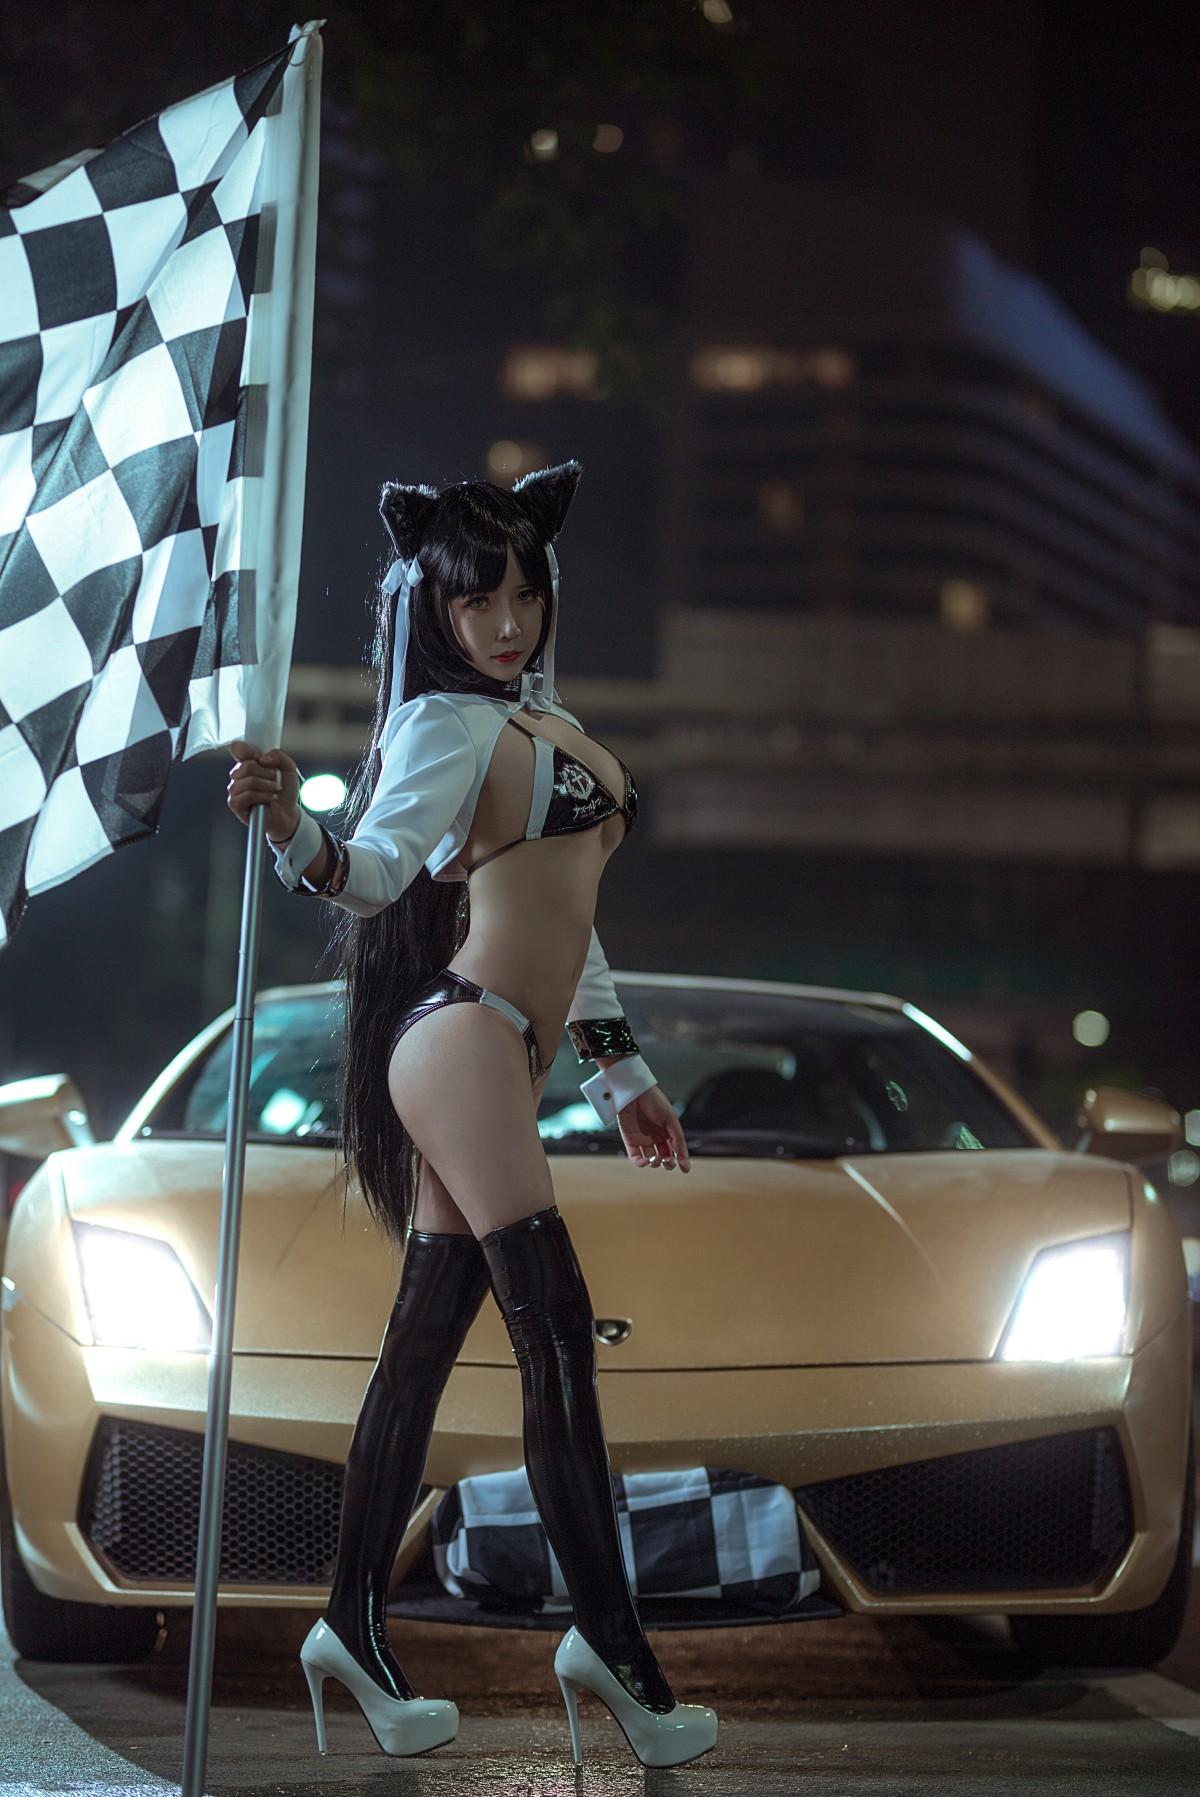 [Cosplay]抱走莫子 赛车女郎[23P] 角色扮演 第1张